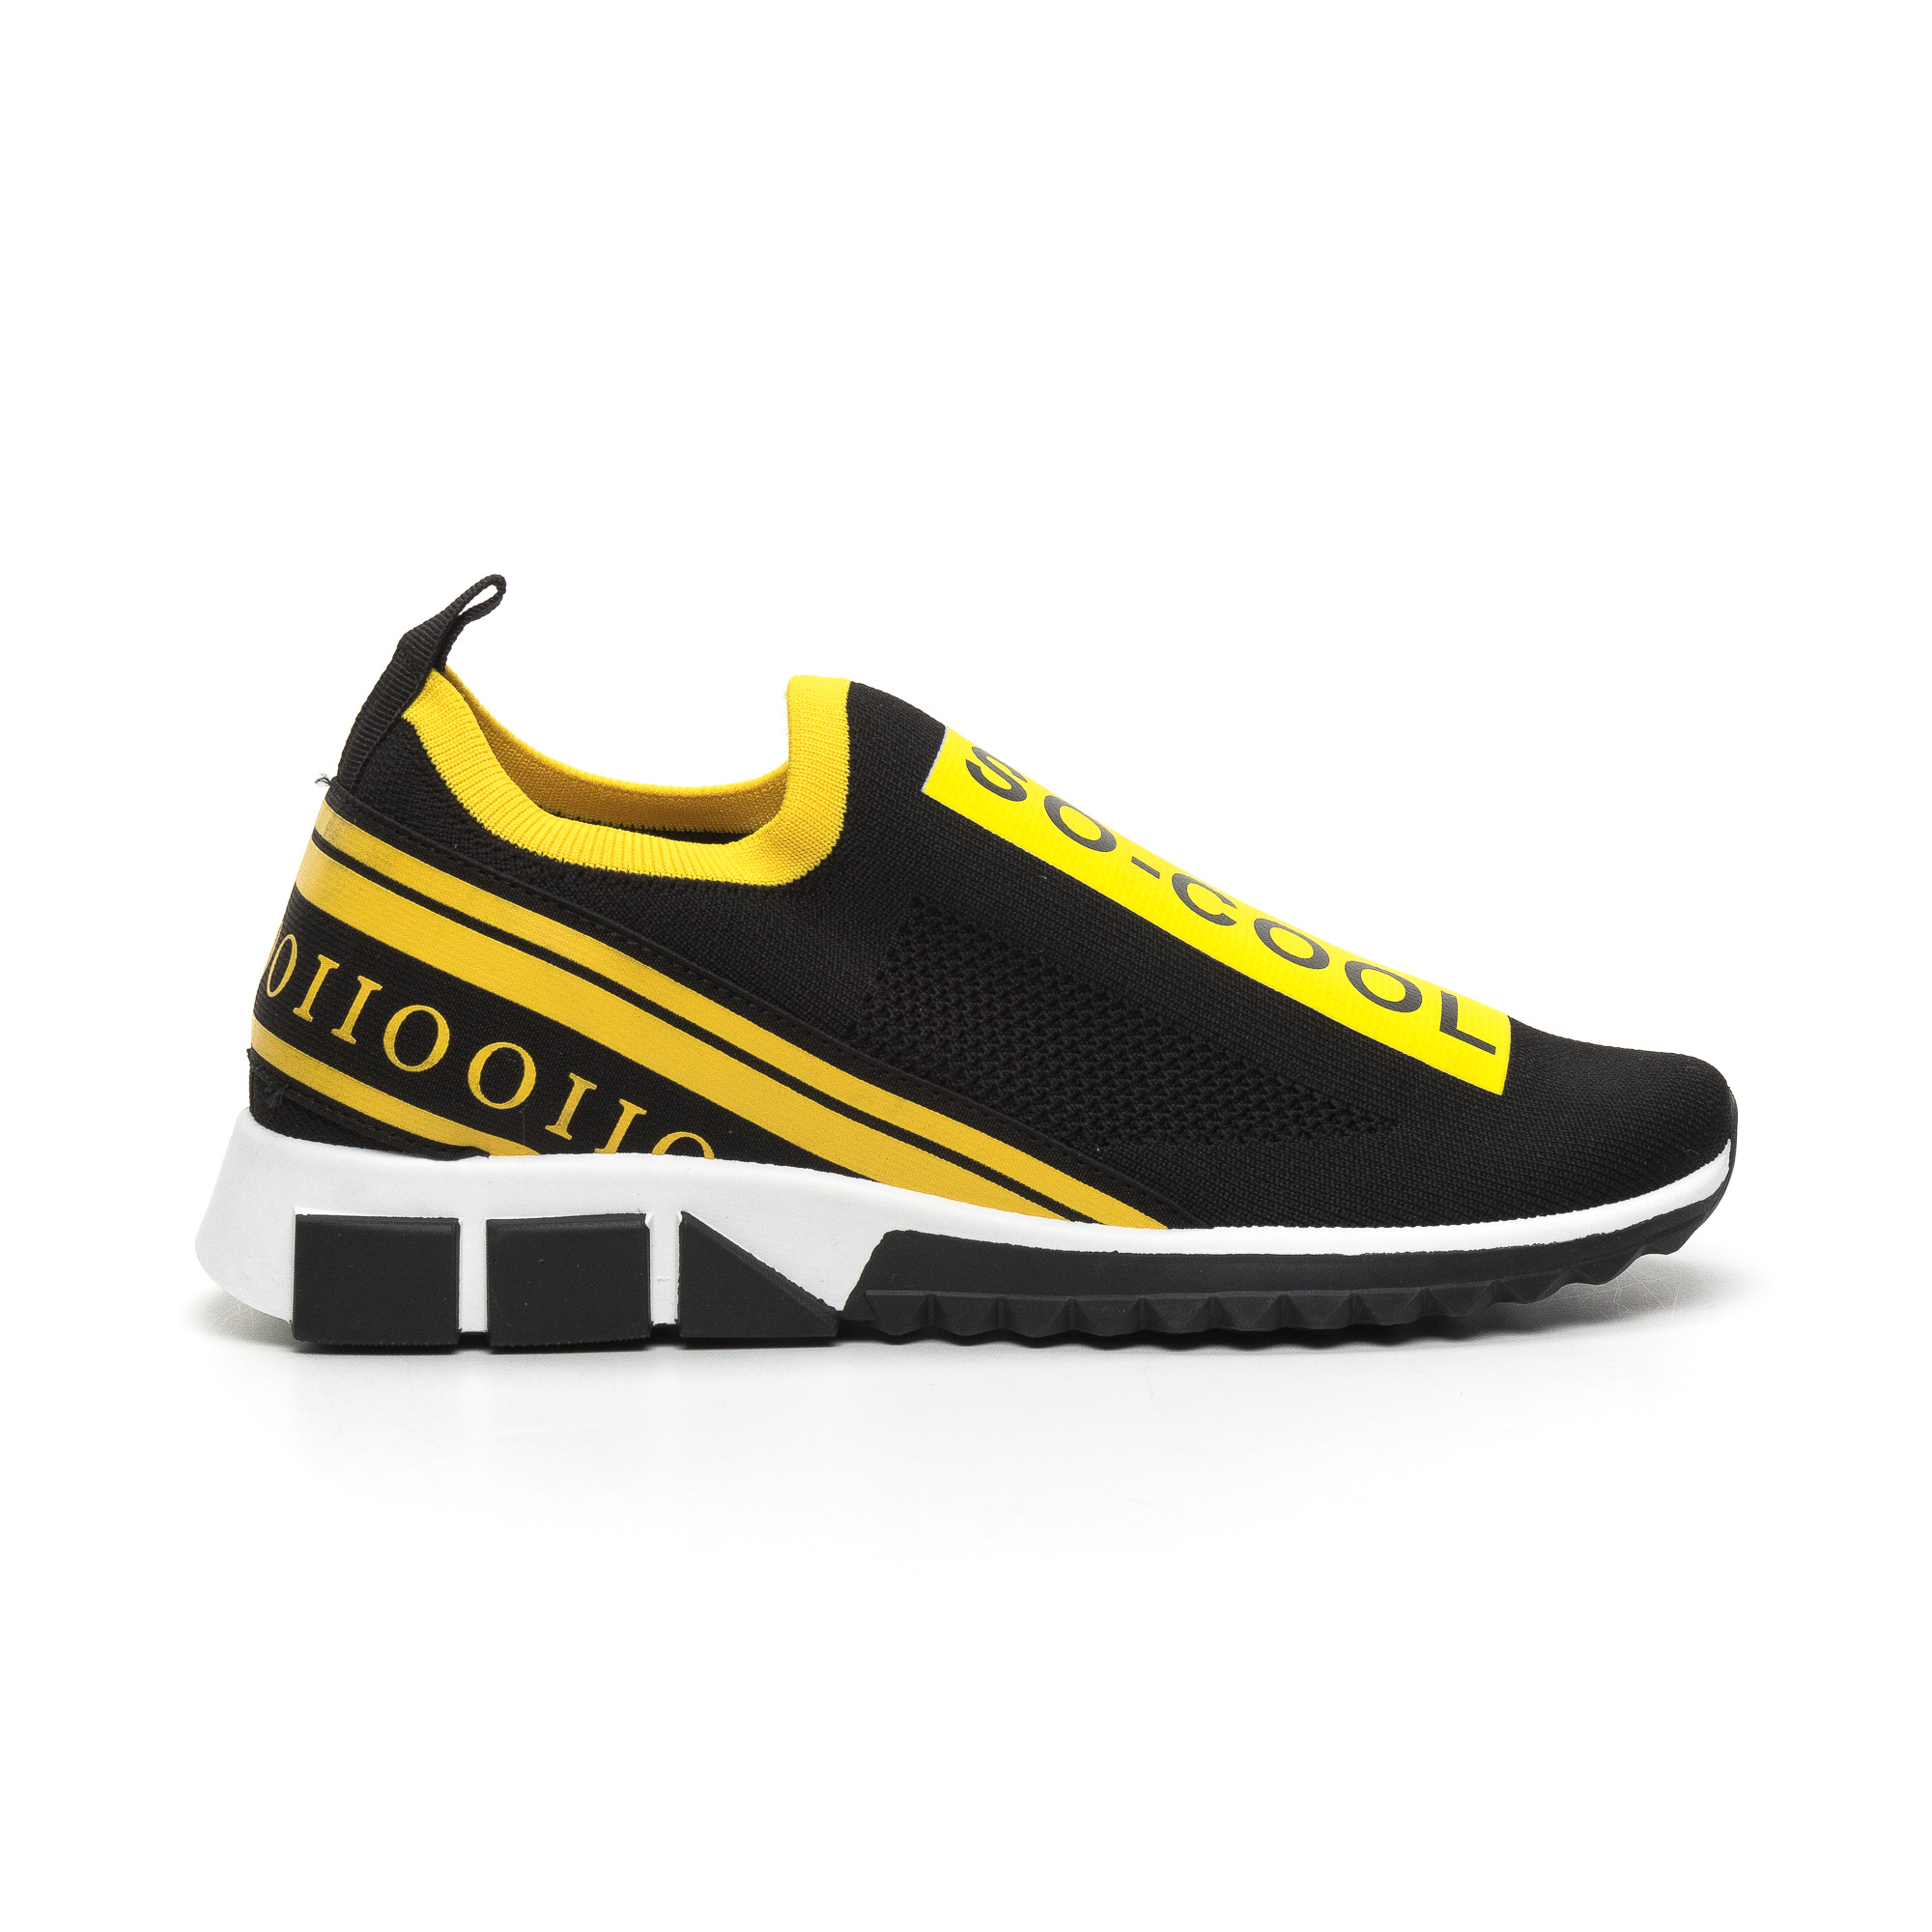 Slip-on ανδρικά μαύρα αθλητικά παπούτσια με κίτρινη ρίγα